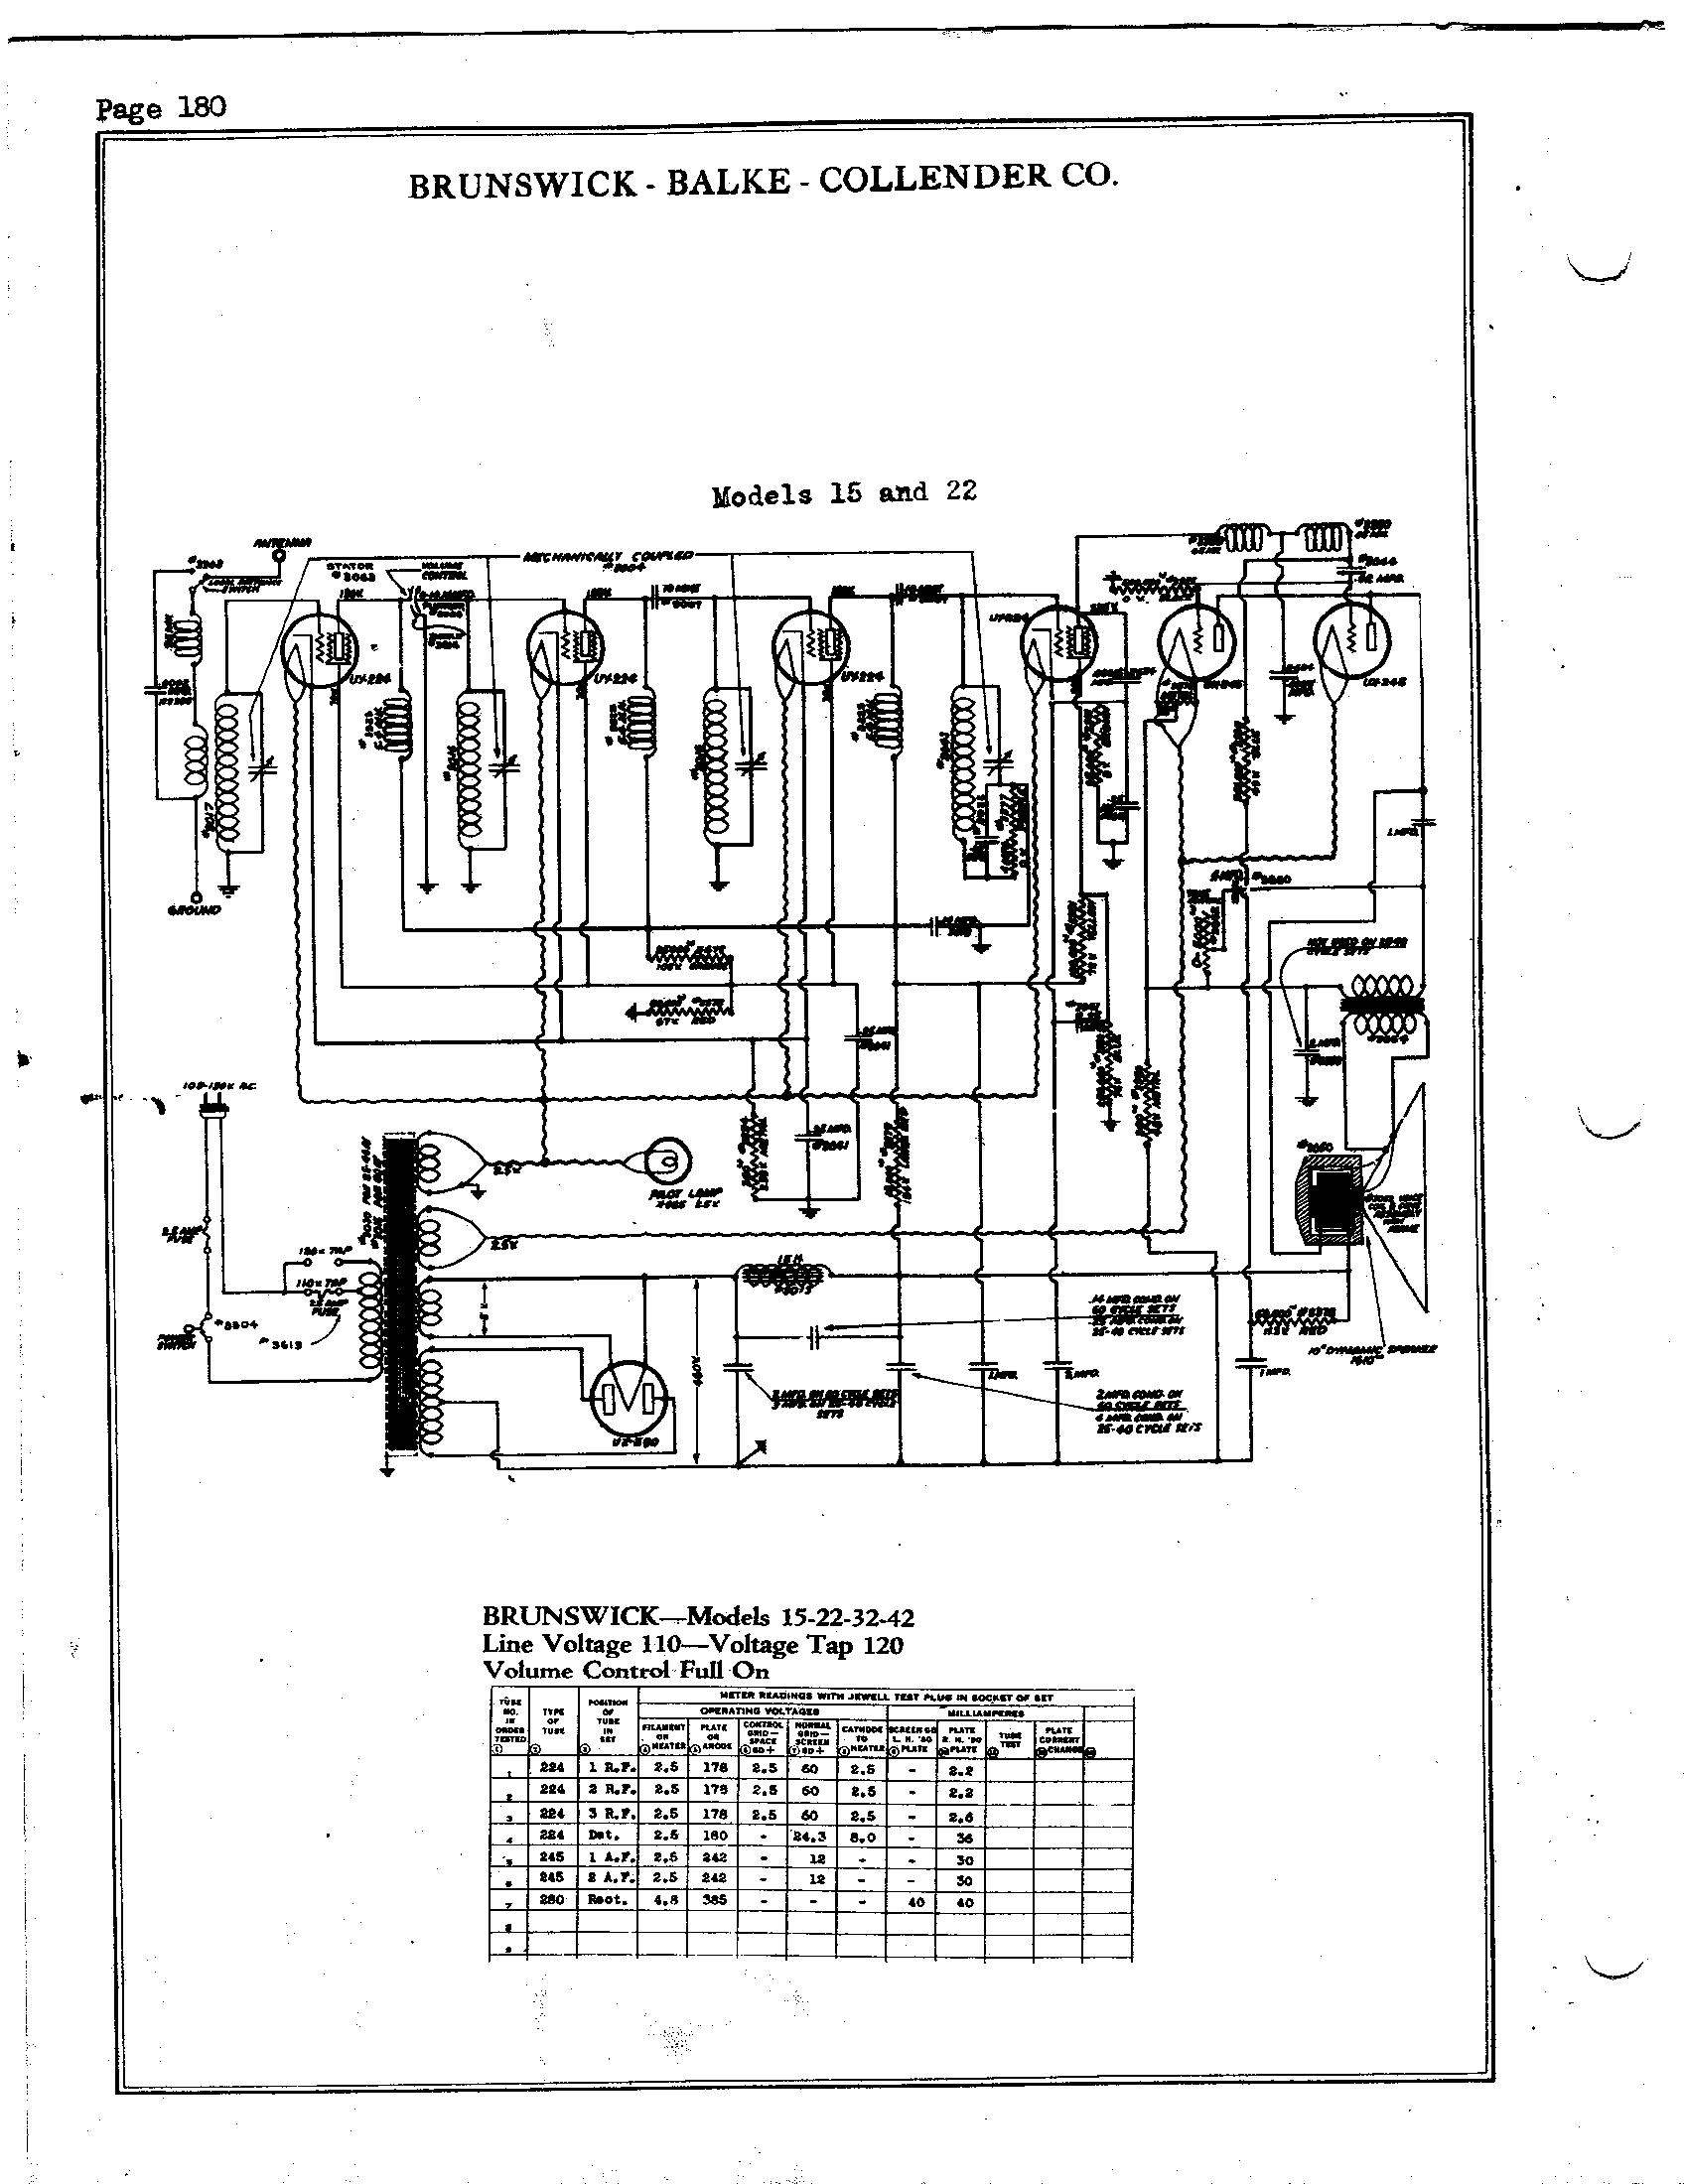 Brunswick Model A Wiring Diagram - Wiring Diagram Database